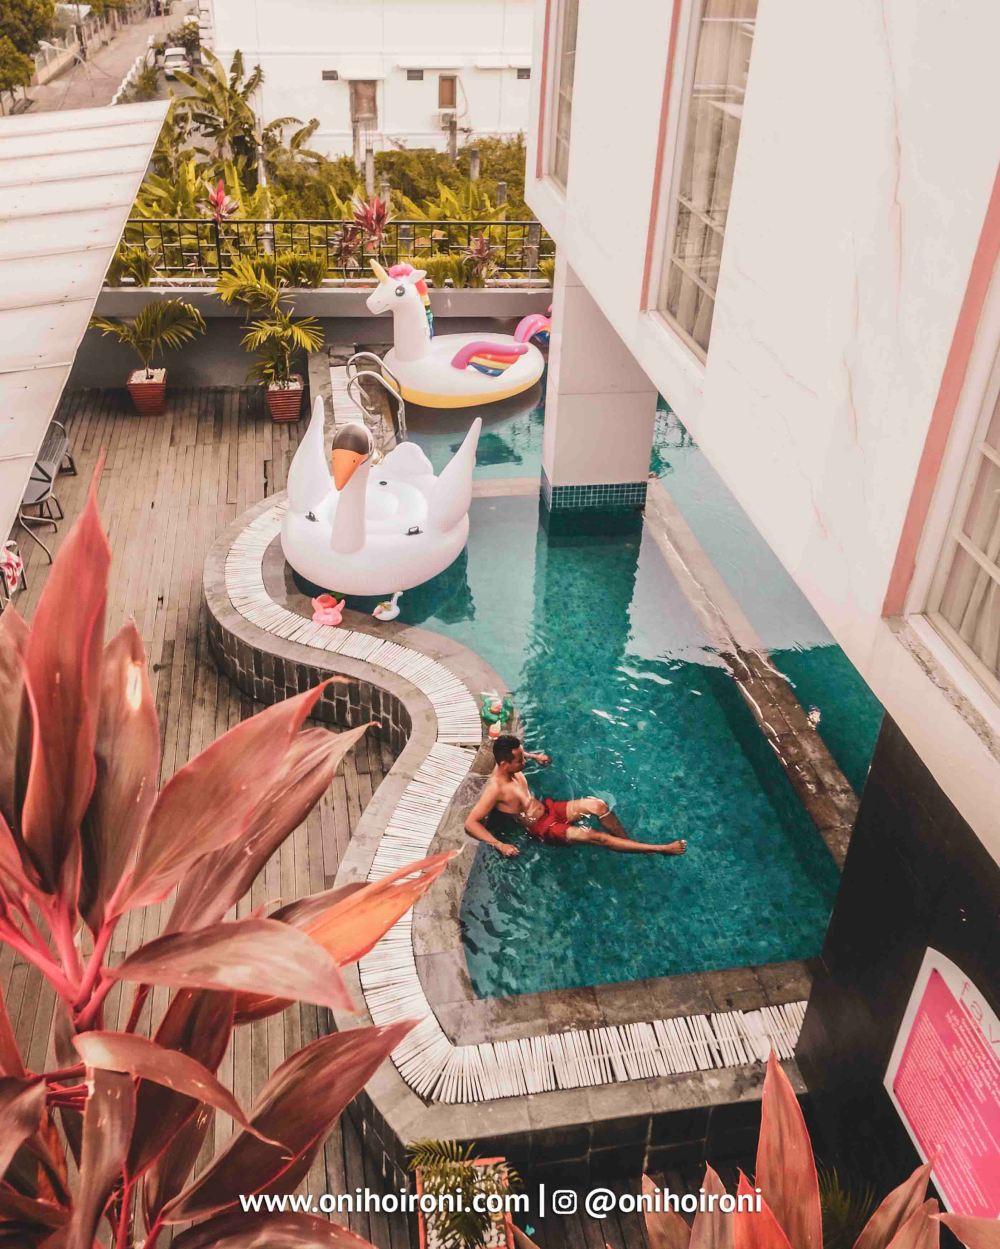 1 Swimming Pool Fave Hotel palembang Oni Hoironi